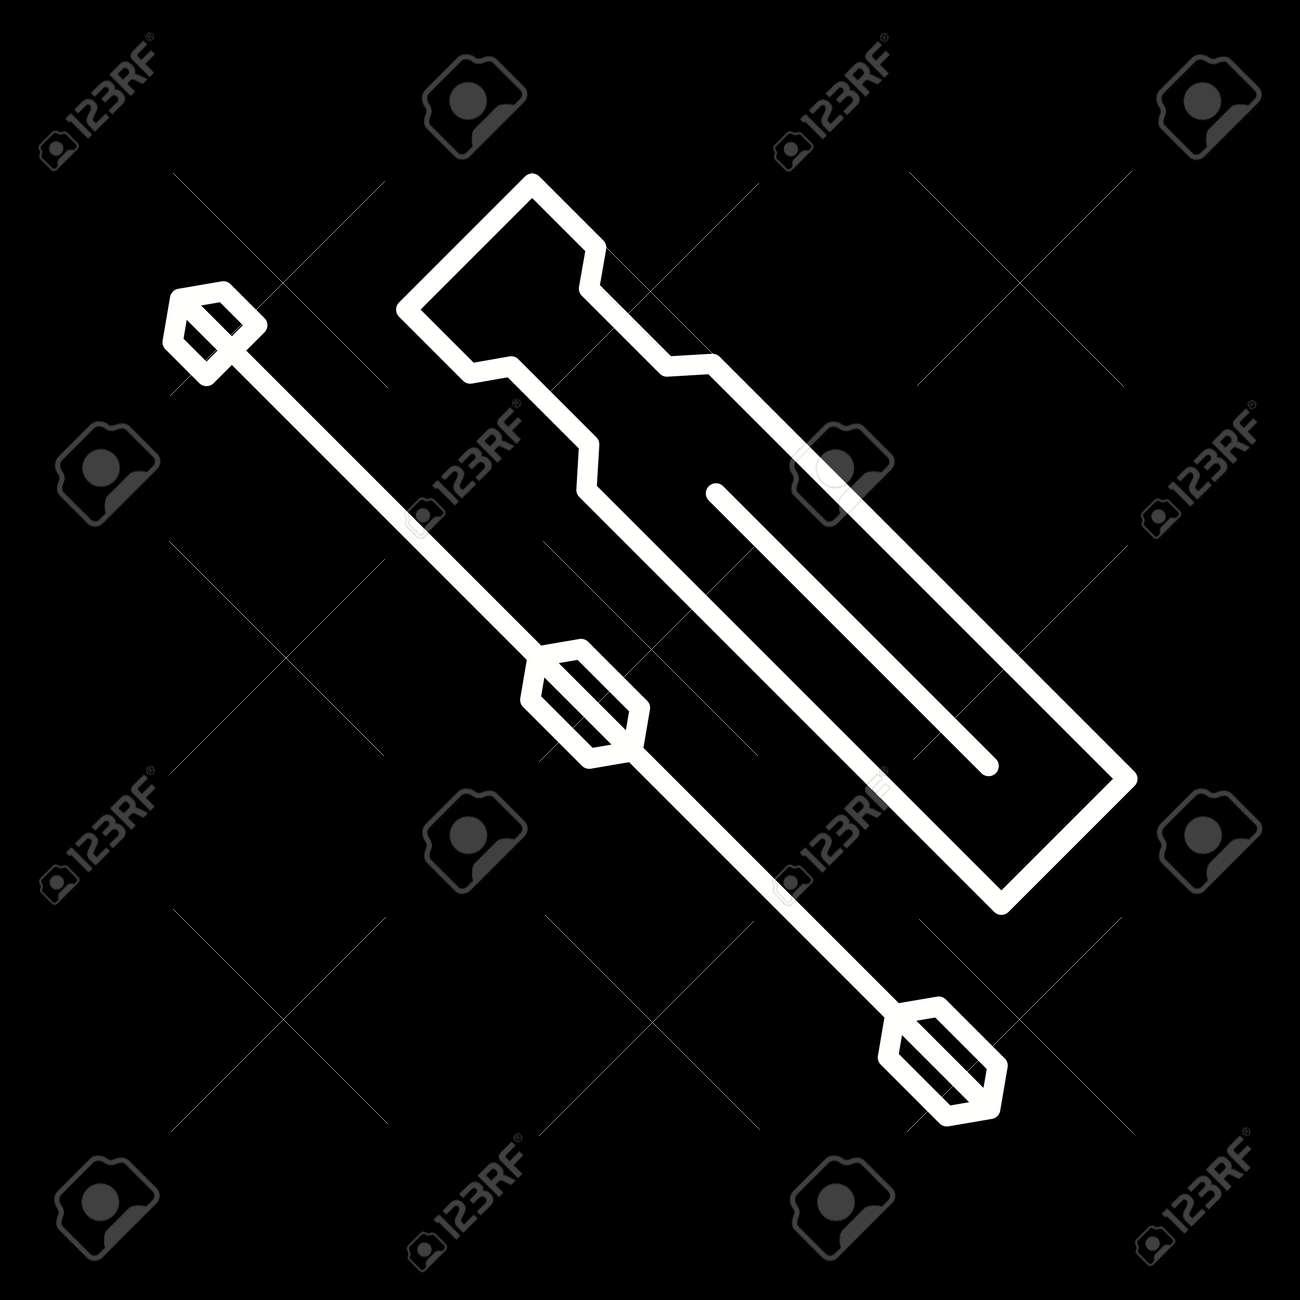 Unique Screwdriver Line Vector Icon - 167962653